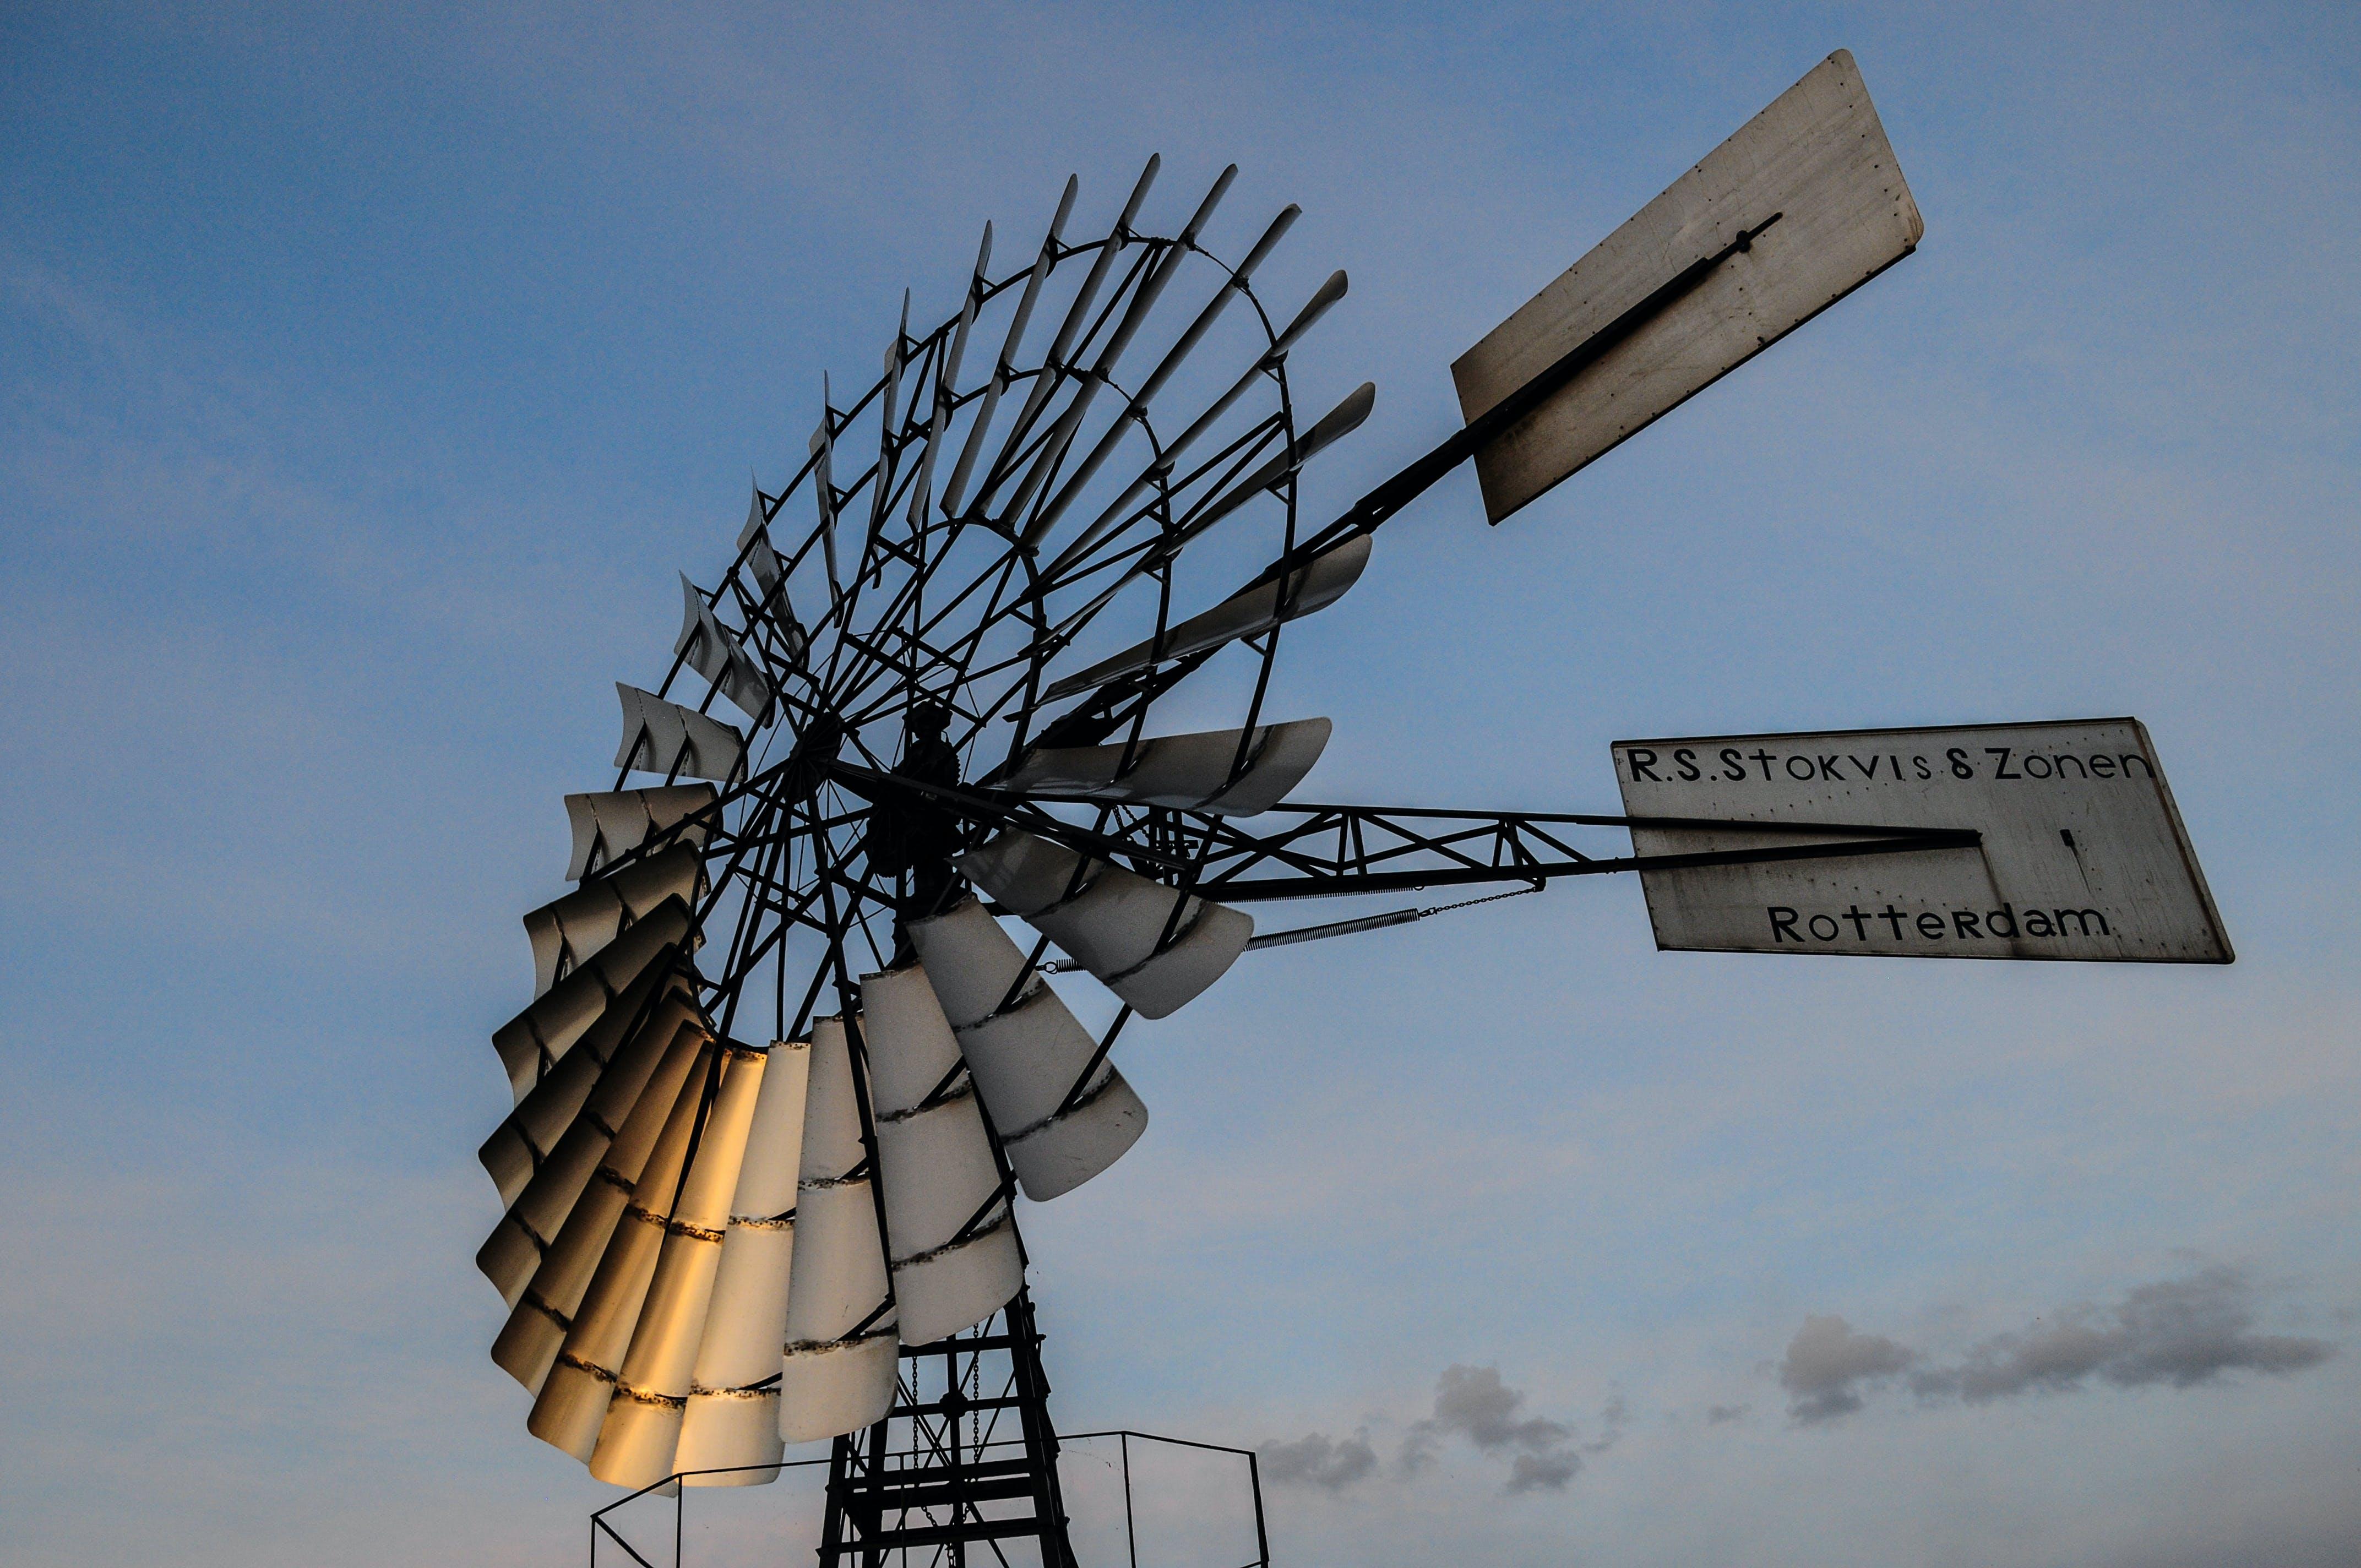 Low-angle Photo of Windmill Pump